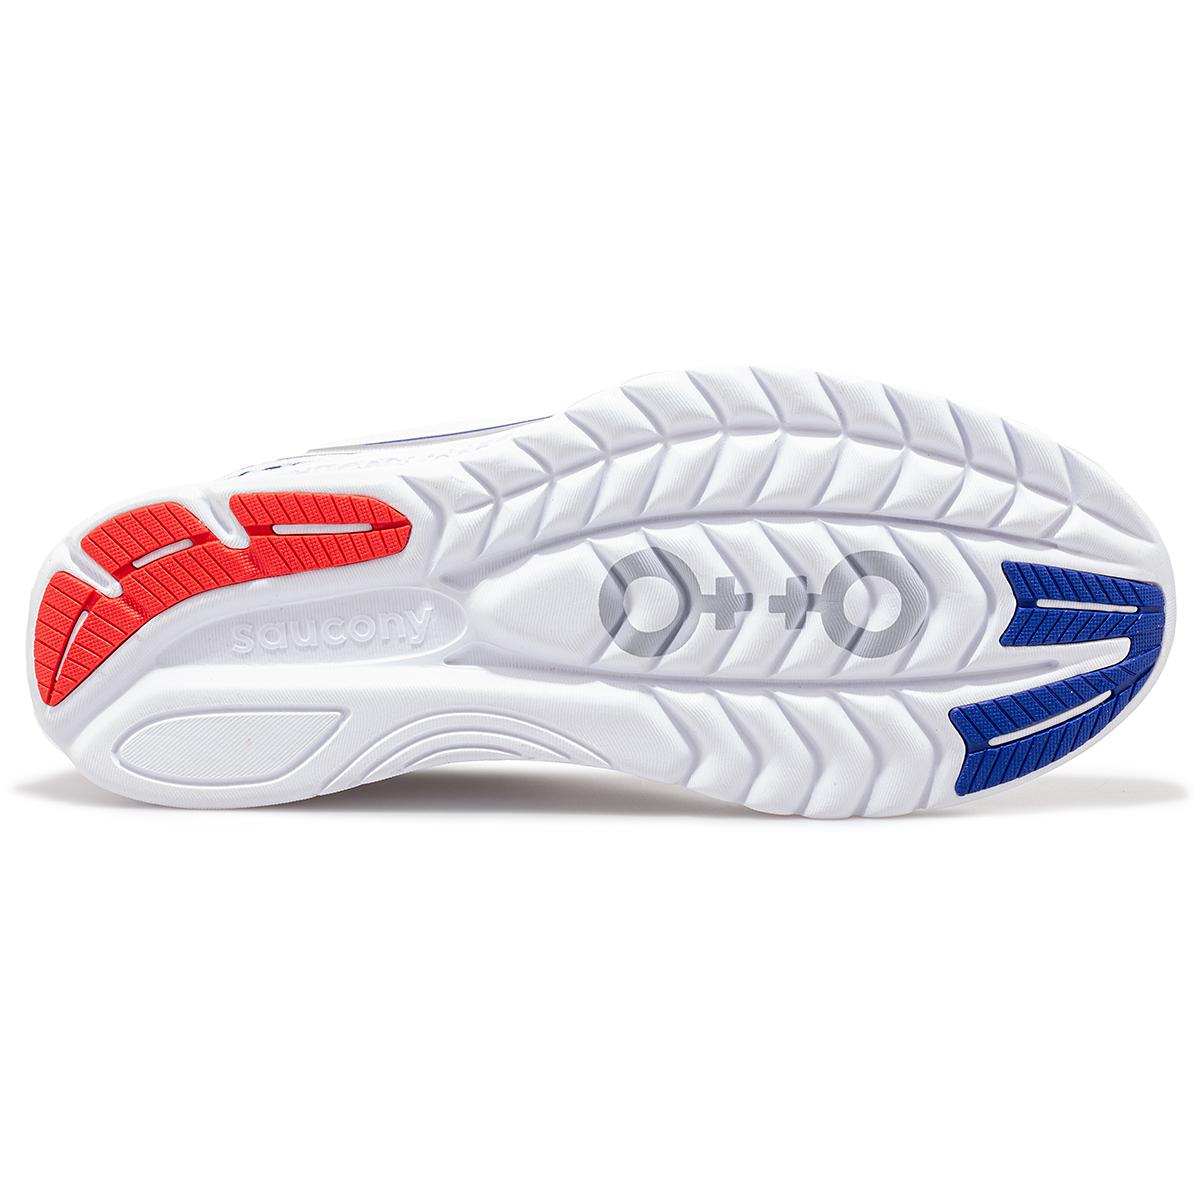 Men's Saucony x Prinkshop Hero Kinvara 11 Running Shoe - Color: Red/White/Blue - Size: 7 - Width: Regular, Red/White/Blue, large, image 4